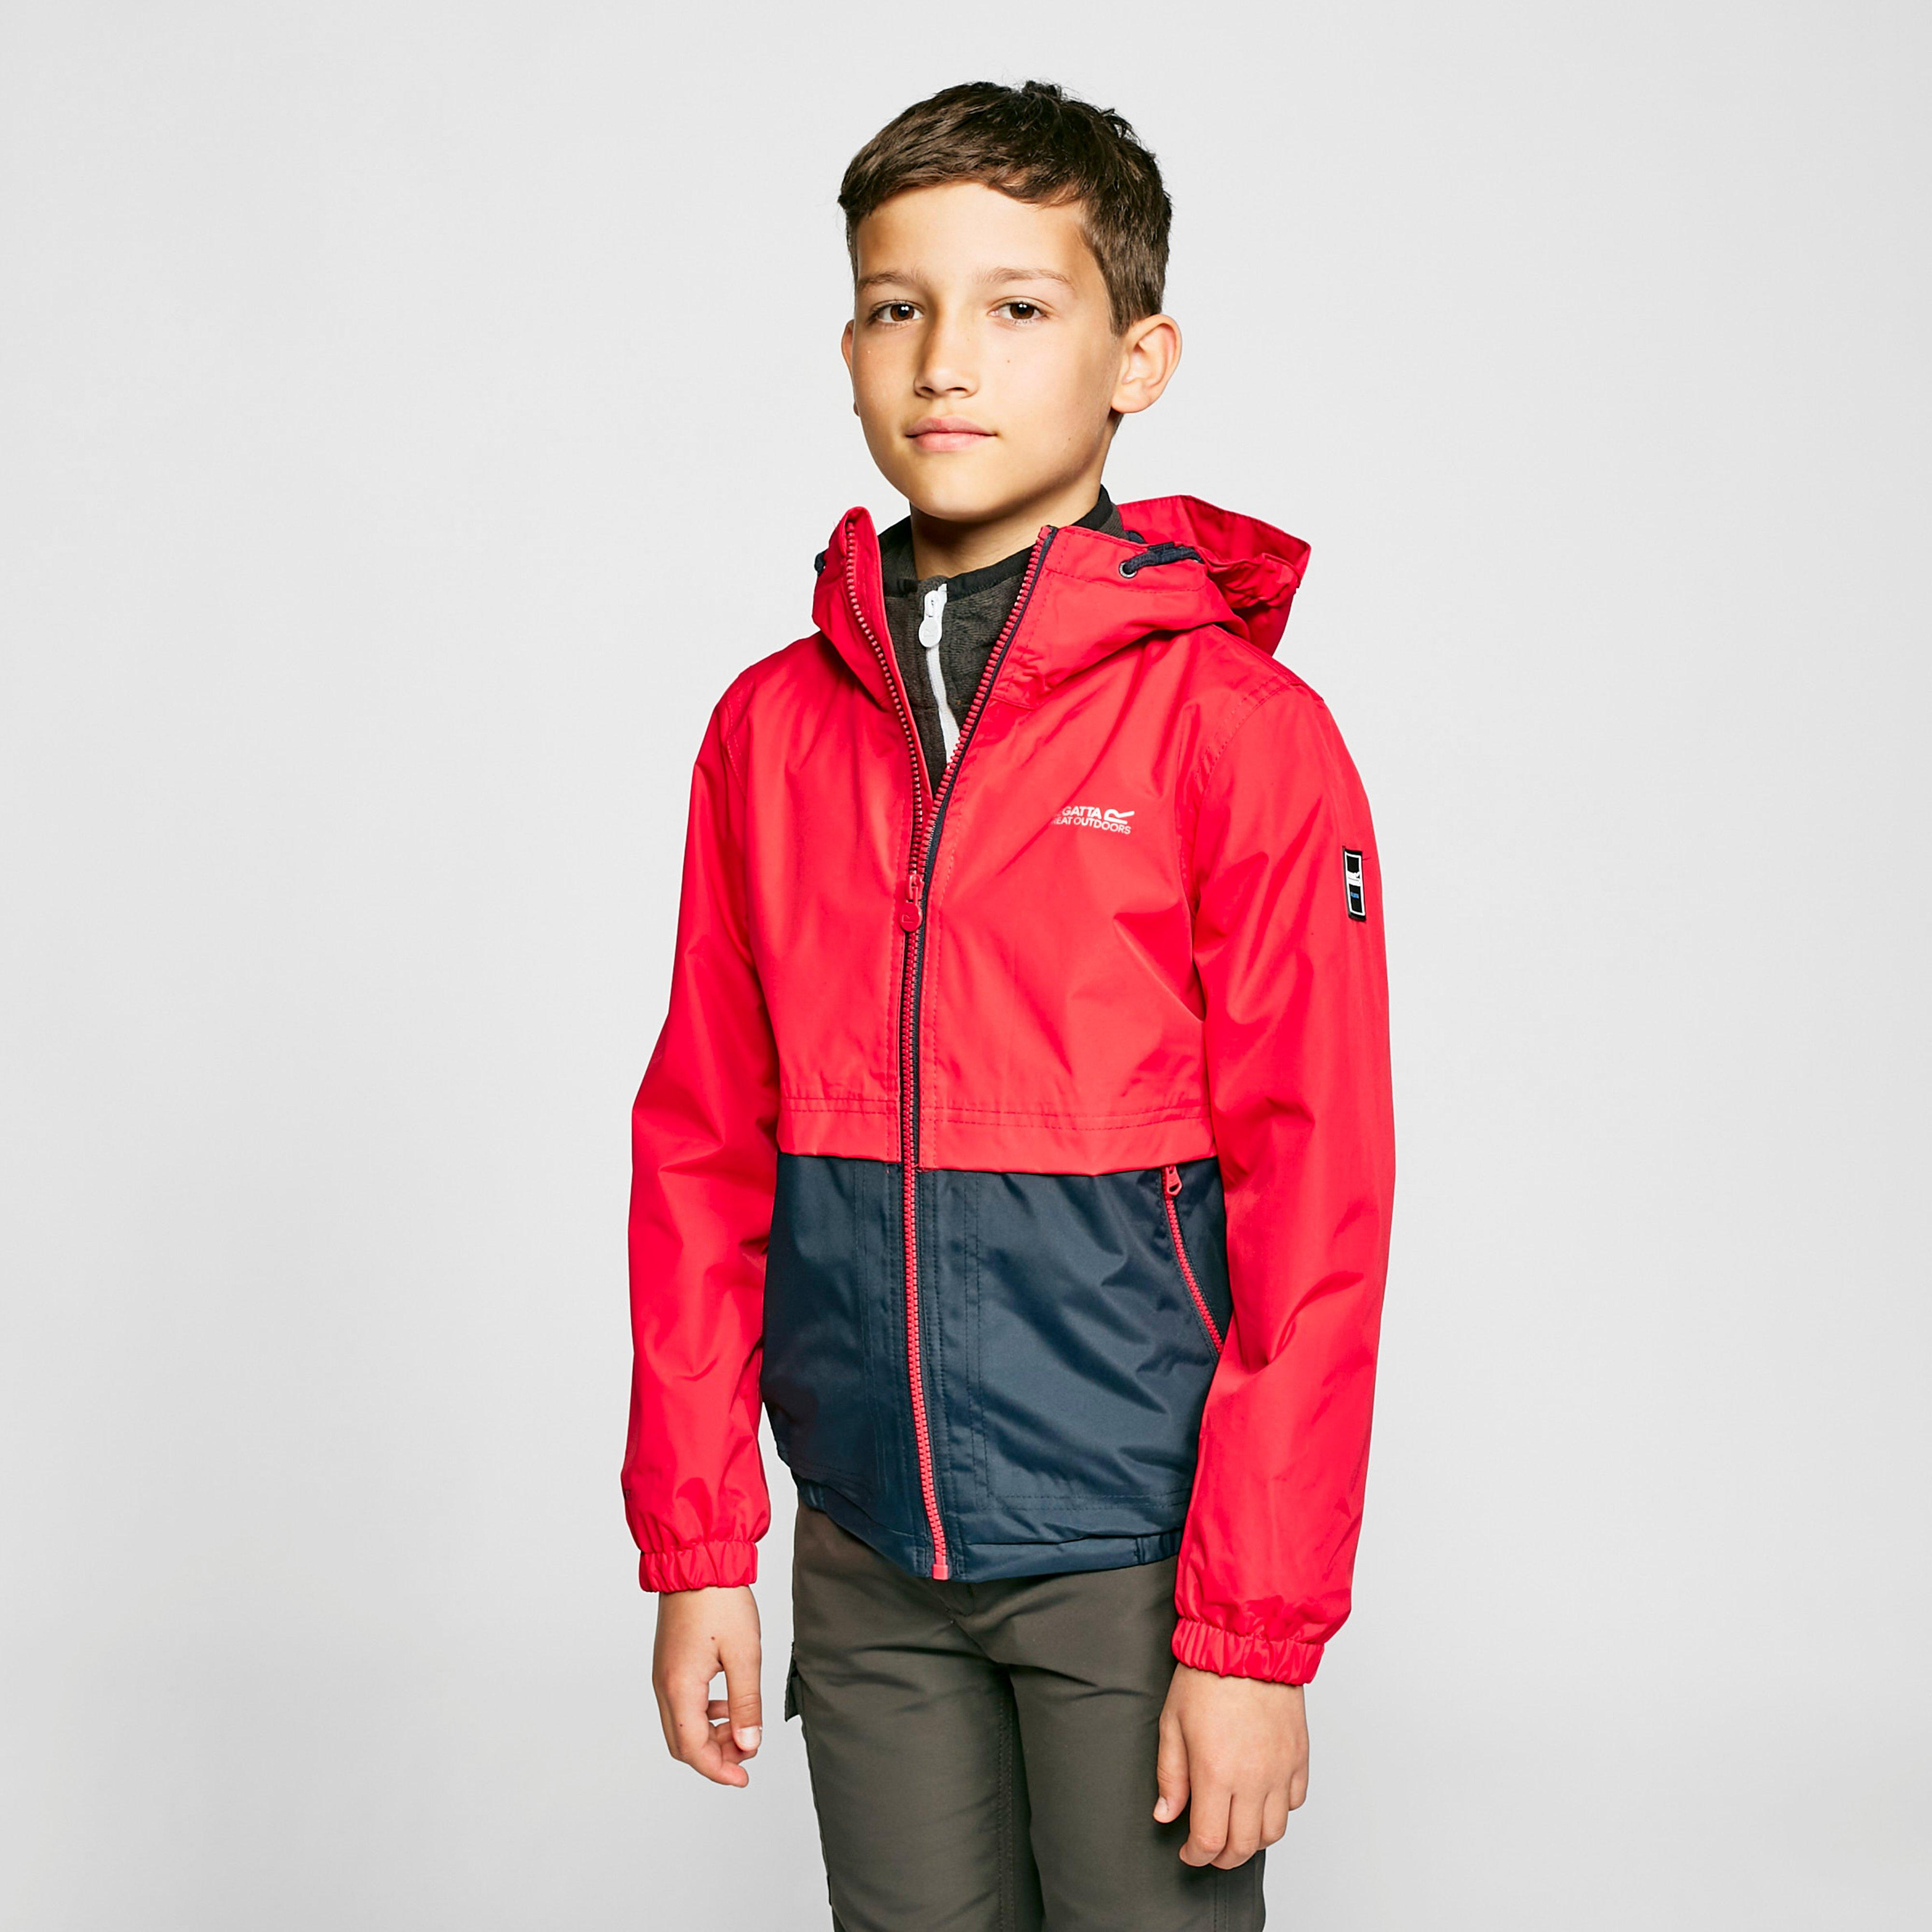 Regatta Kids' Haskel Waterproof Jacket - Nvy/Red/Nvy/Red, Navy/Red